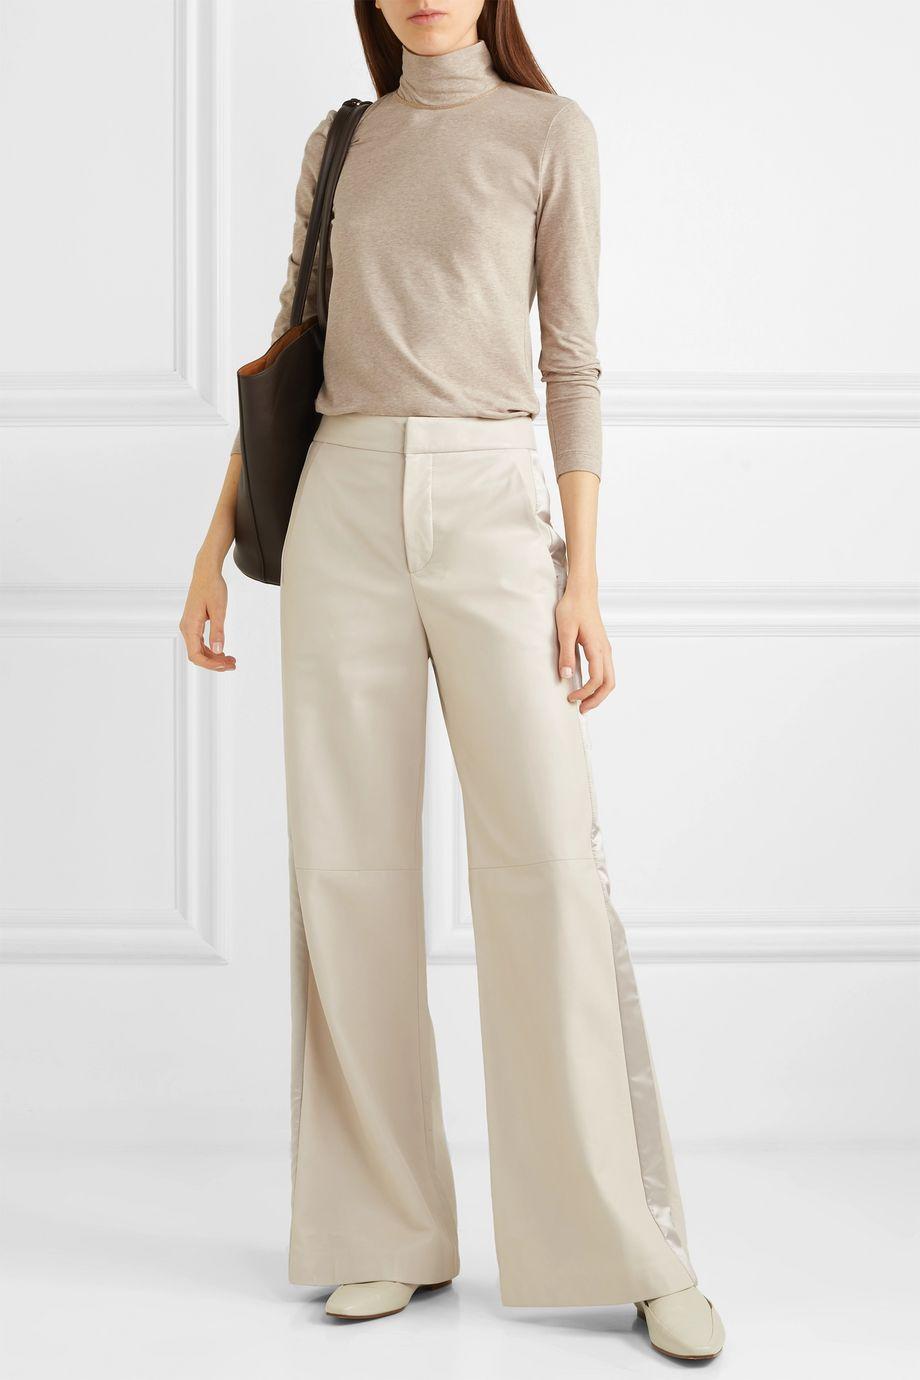 Brunello Cucinelli Bead-embellished mélange stretch cotton-jersey turtleneck top